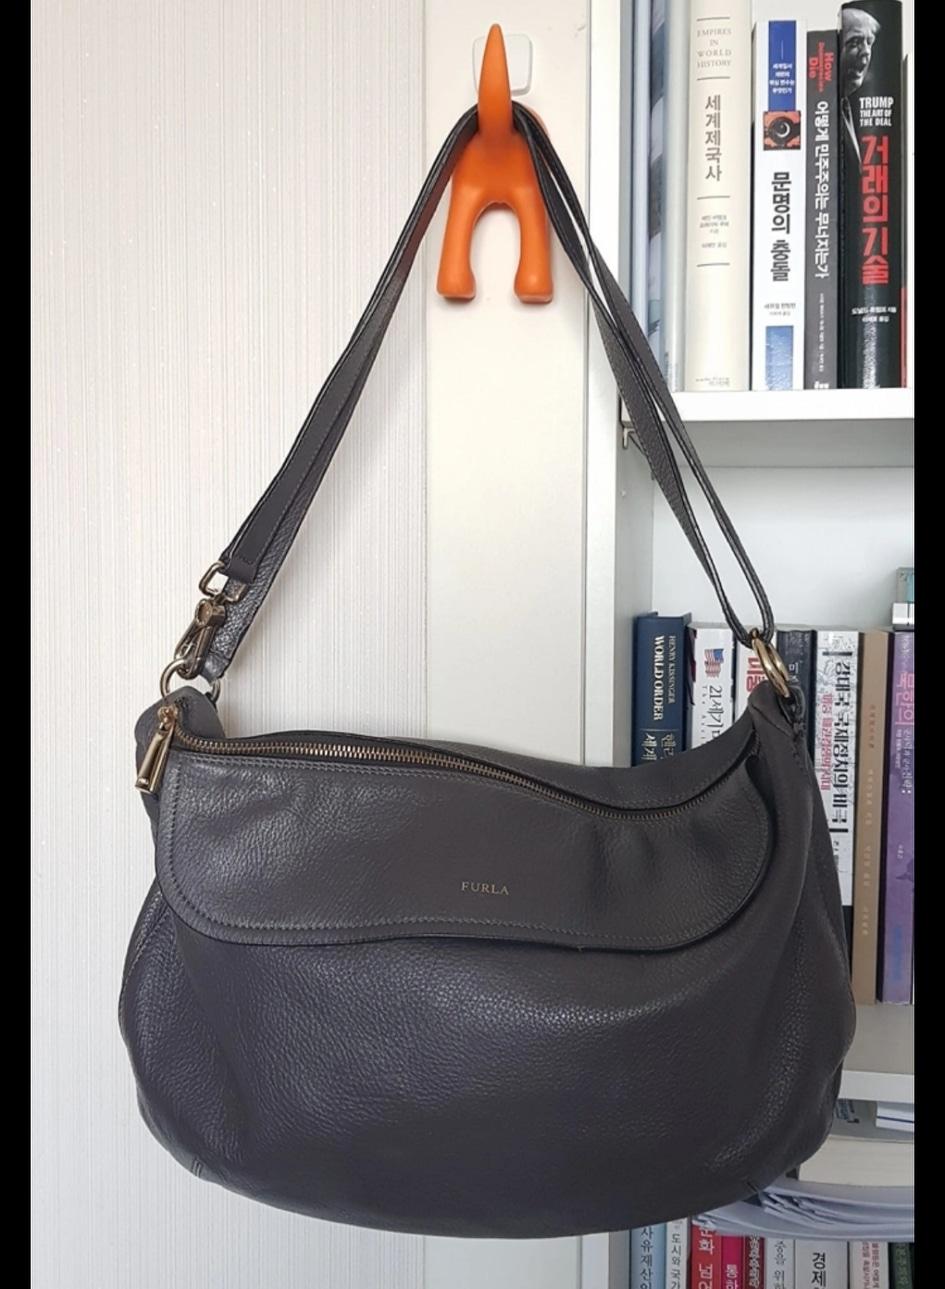 fulra 가방